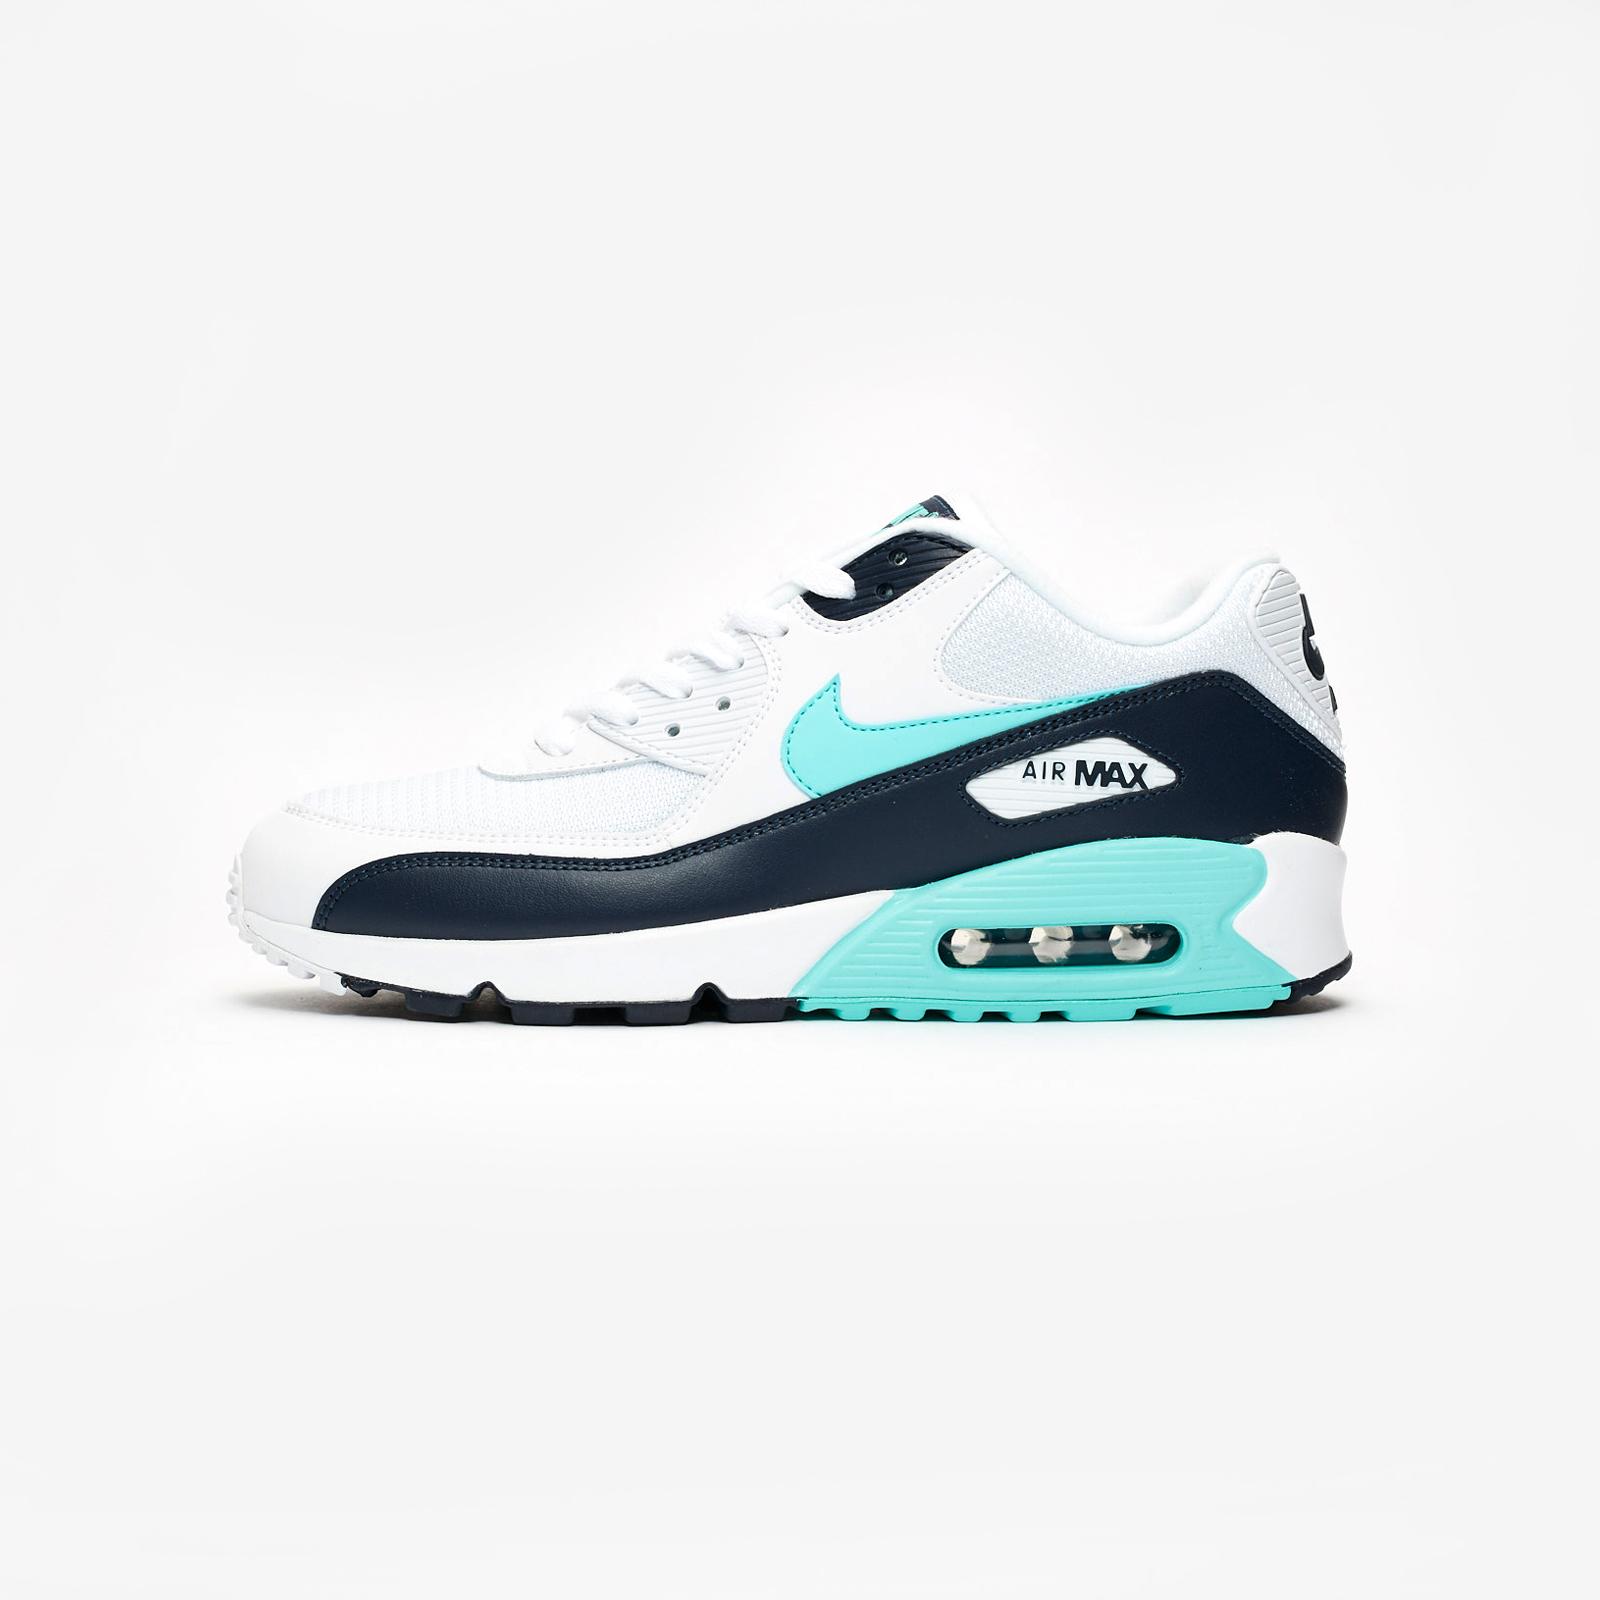 official photos 0f130 0b613 Nike Air Max 90 Essential - Aj1285-102 - Sneakersnstuff   sneakers    streetwear online since 1999